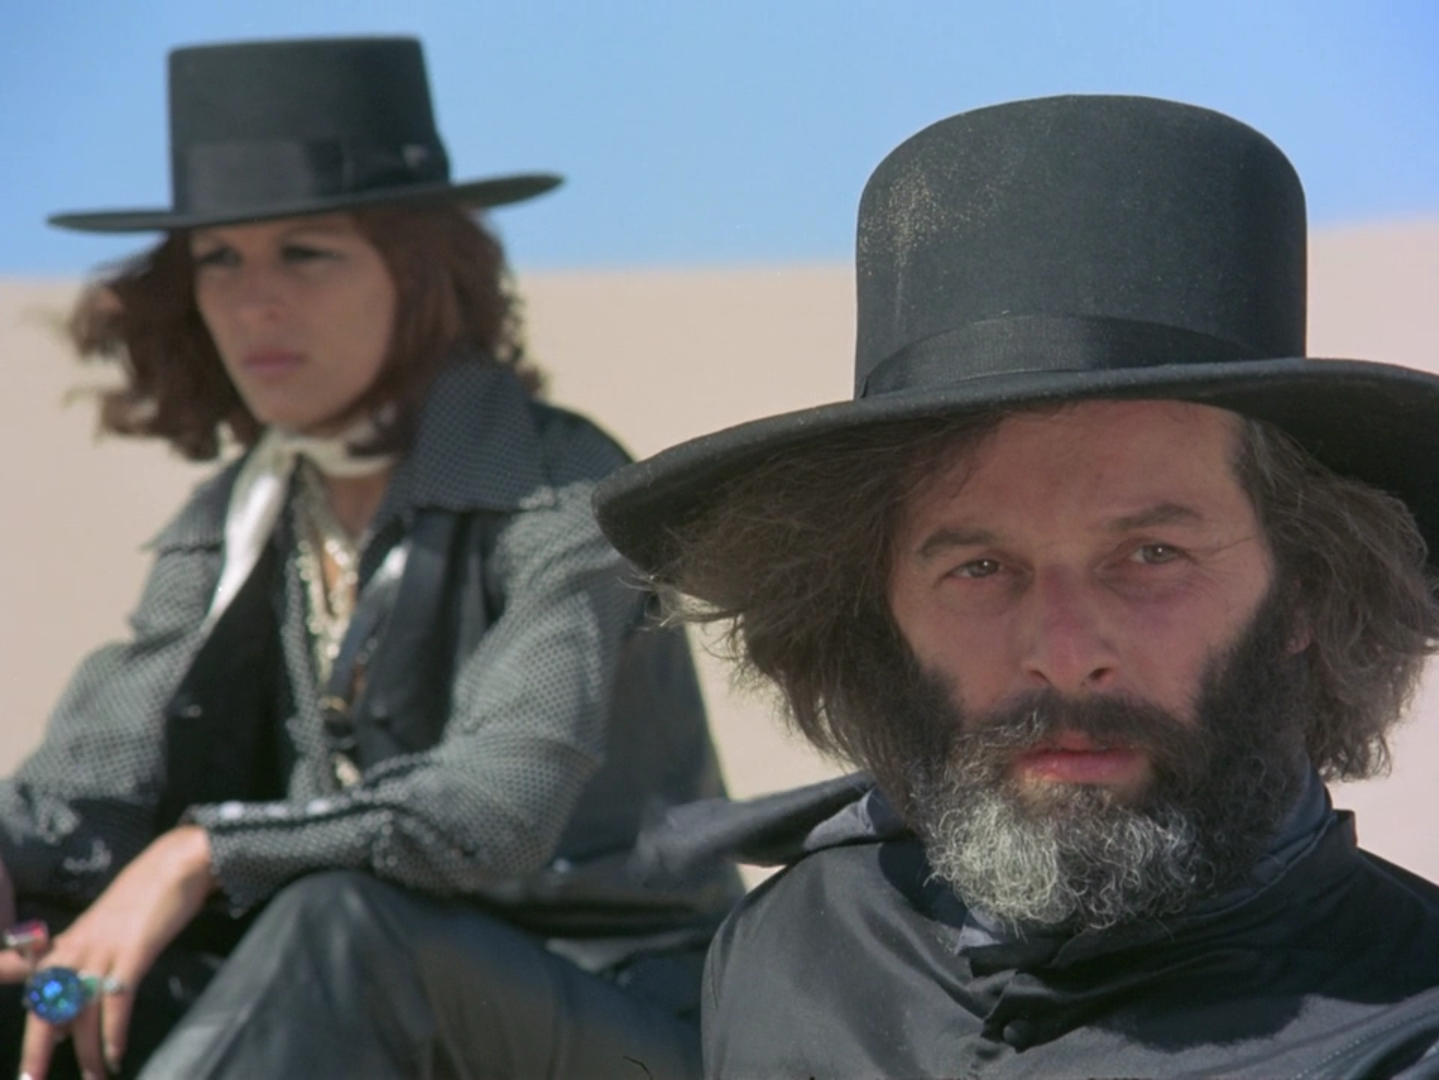 [HOME VIDEO] El Topo + The Holy Mountain - I Film Cult Di